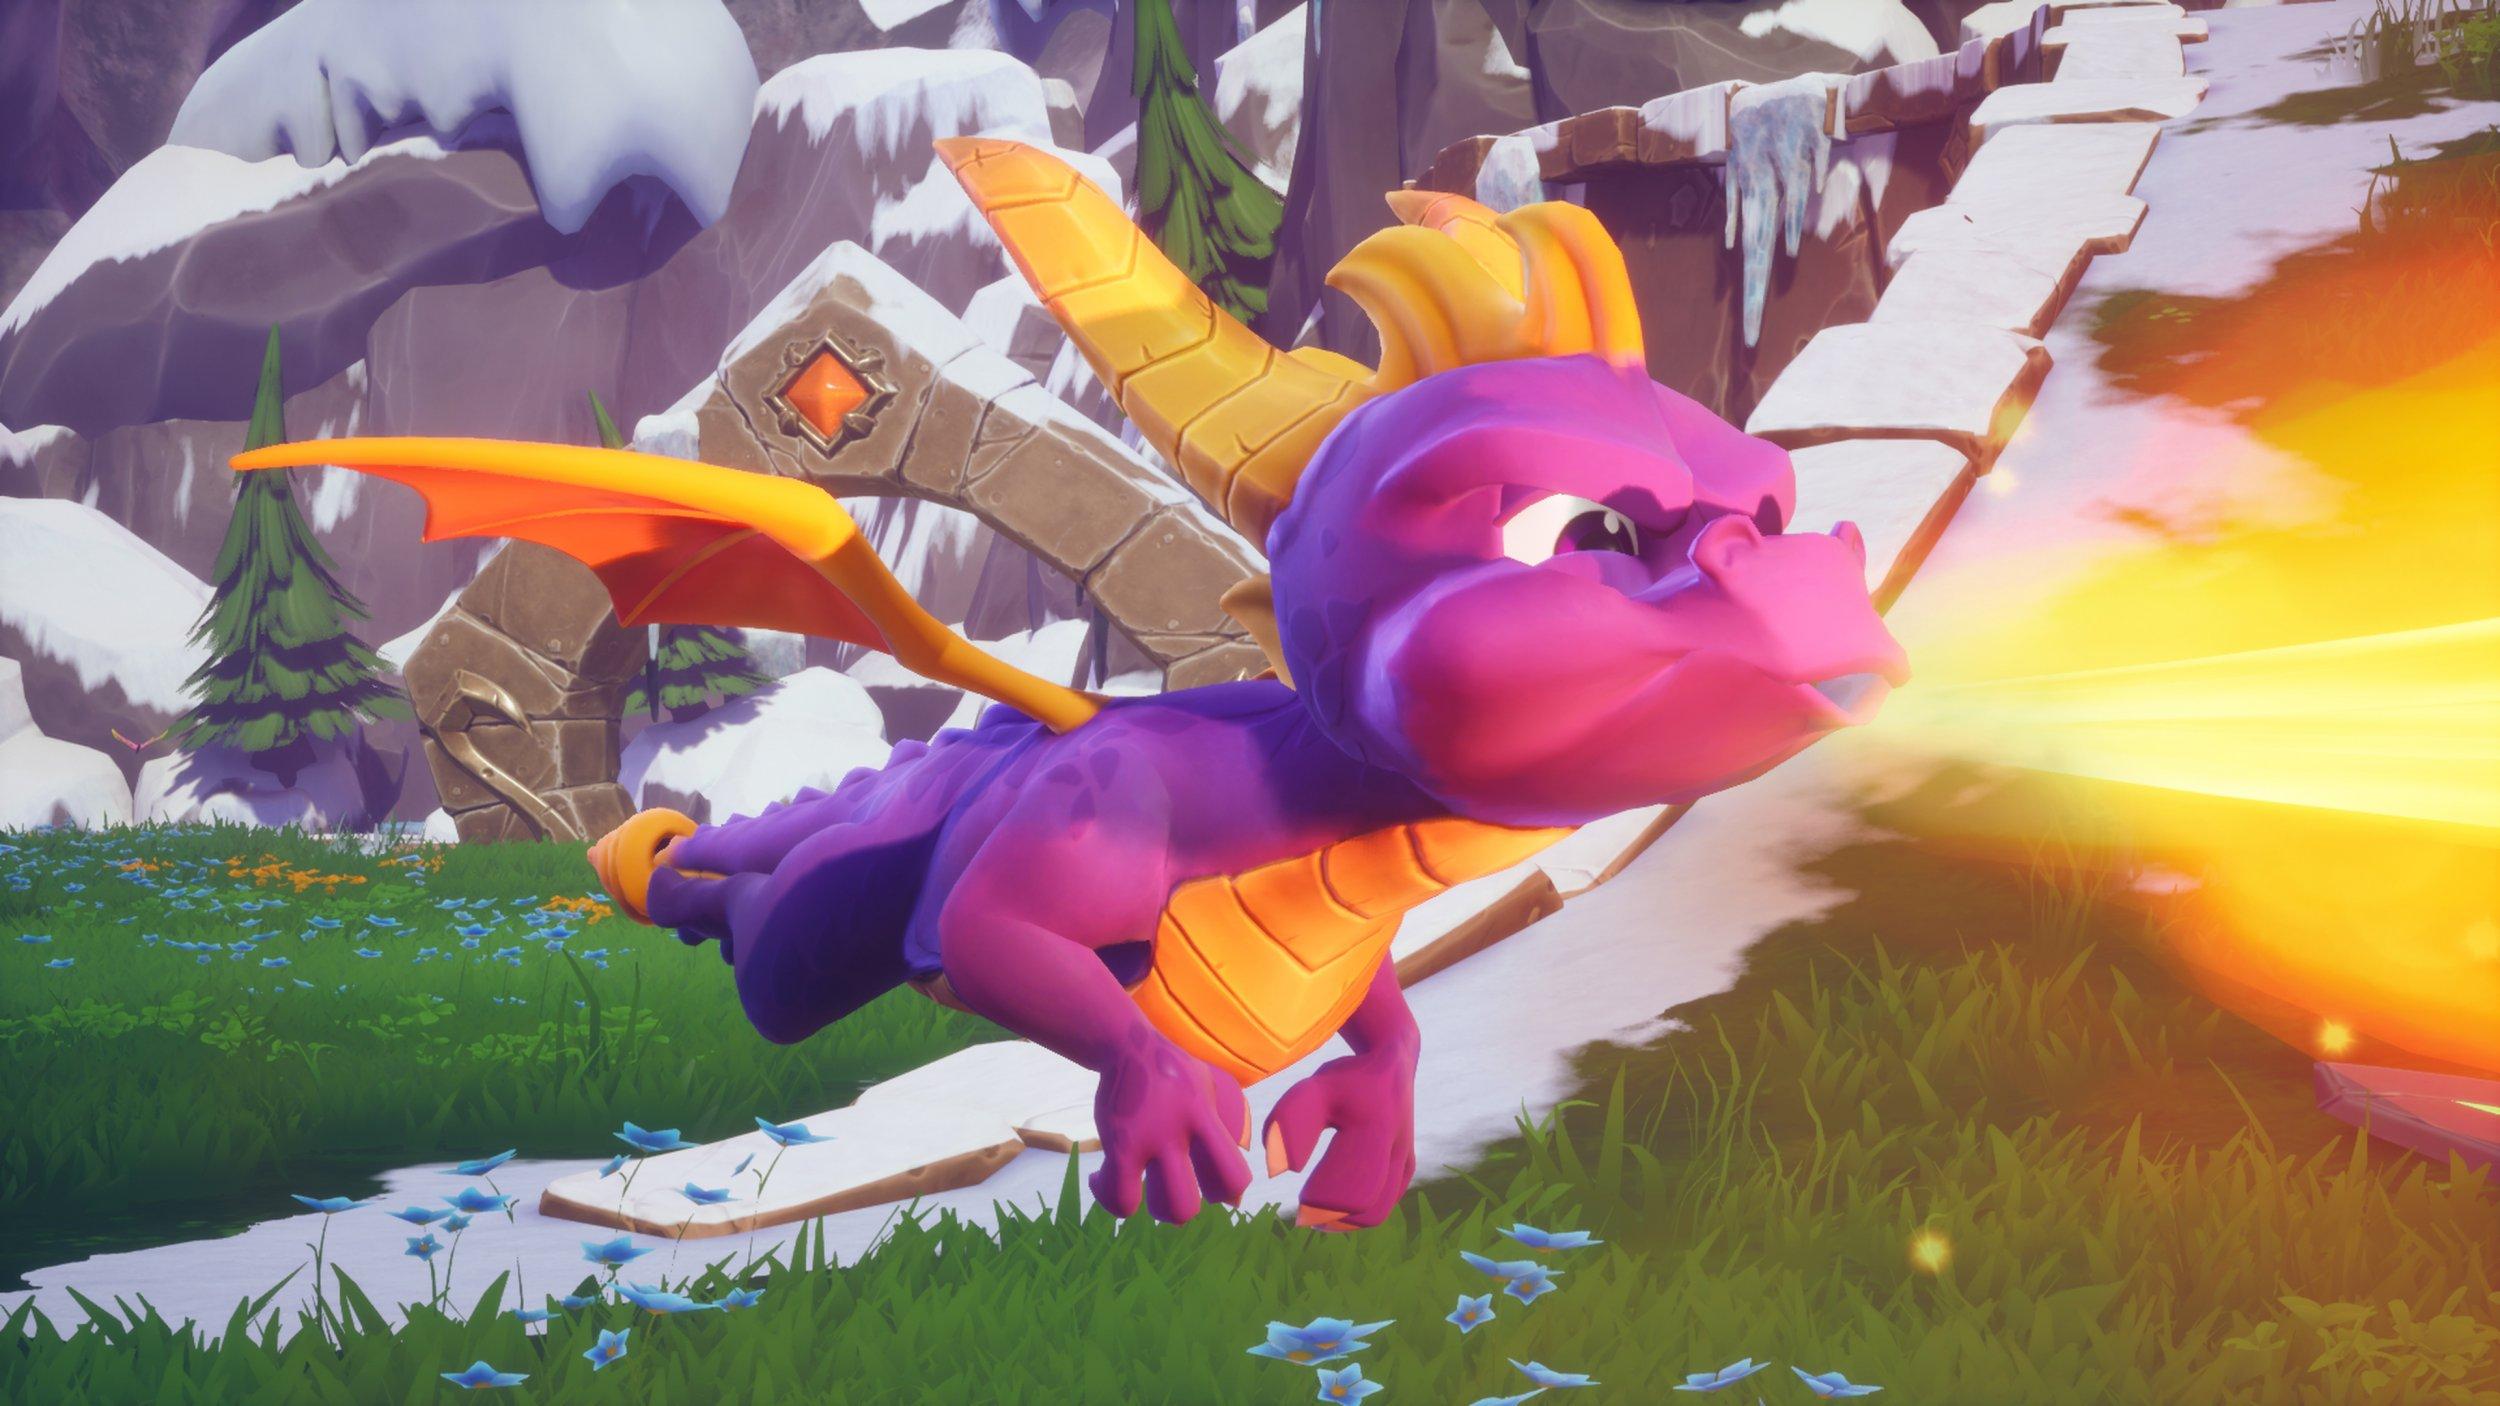 Why Spyro Reignited Trilogy Creators Kept Its Past Alive